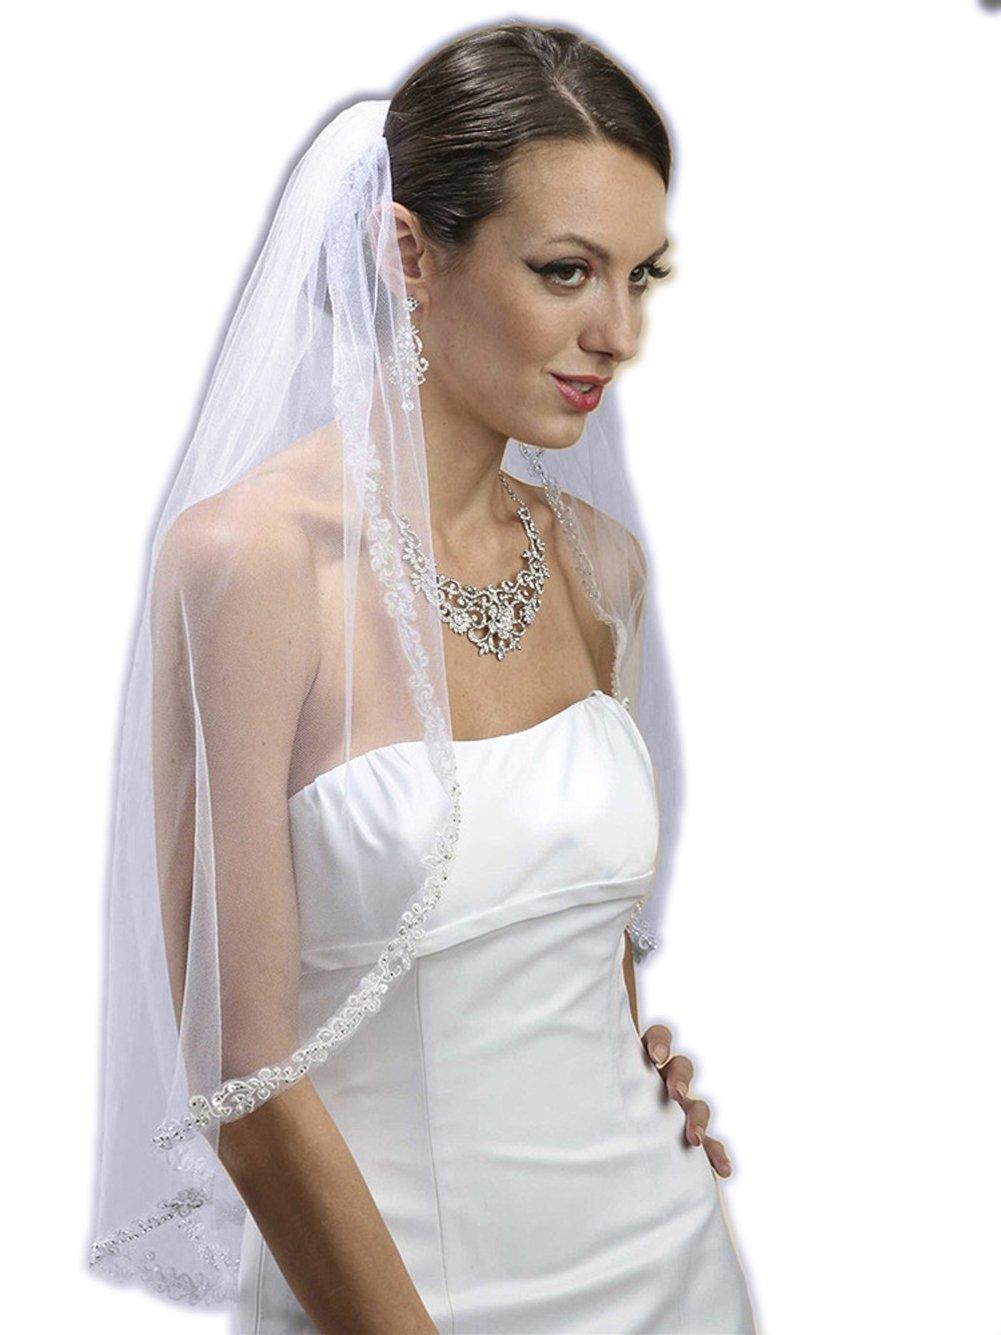 Mariell Women's Rhinestone Edge Mantilla Wedding Veil with Floral Applique - White